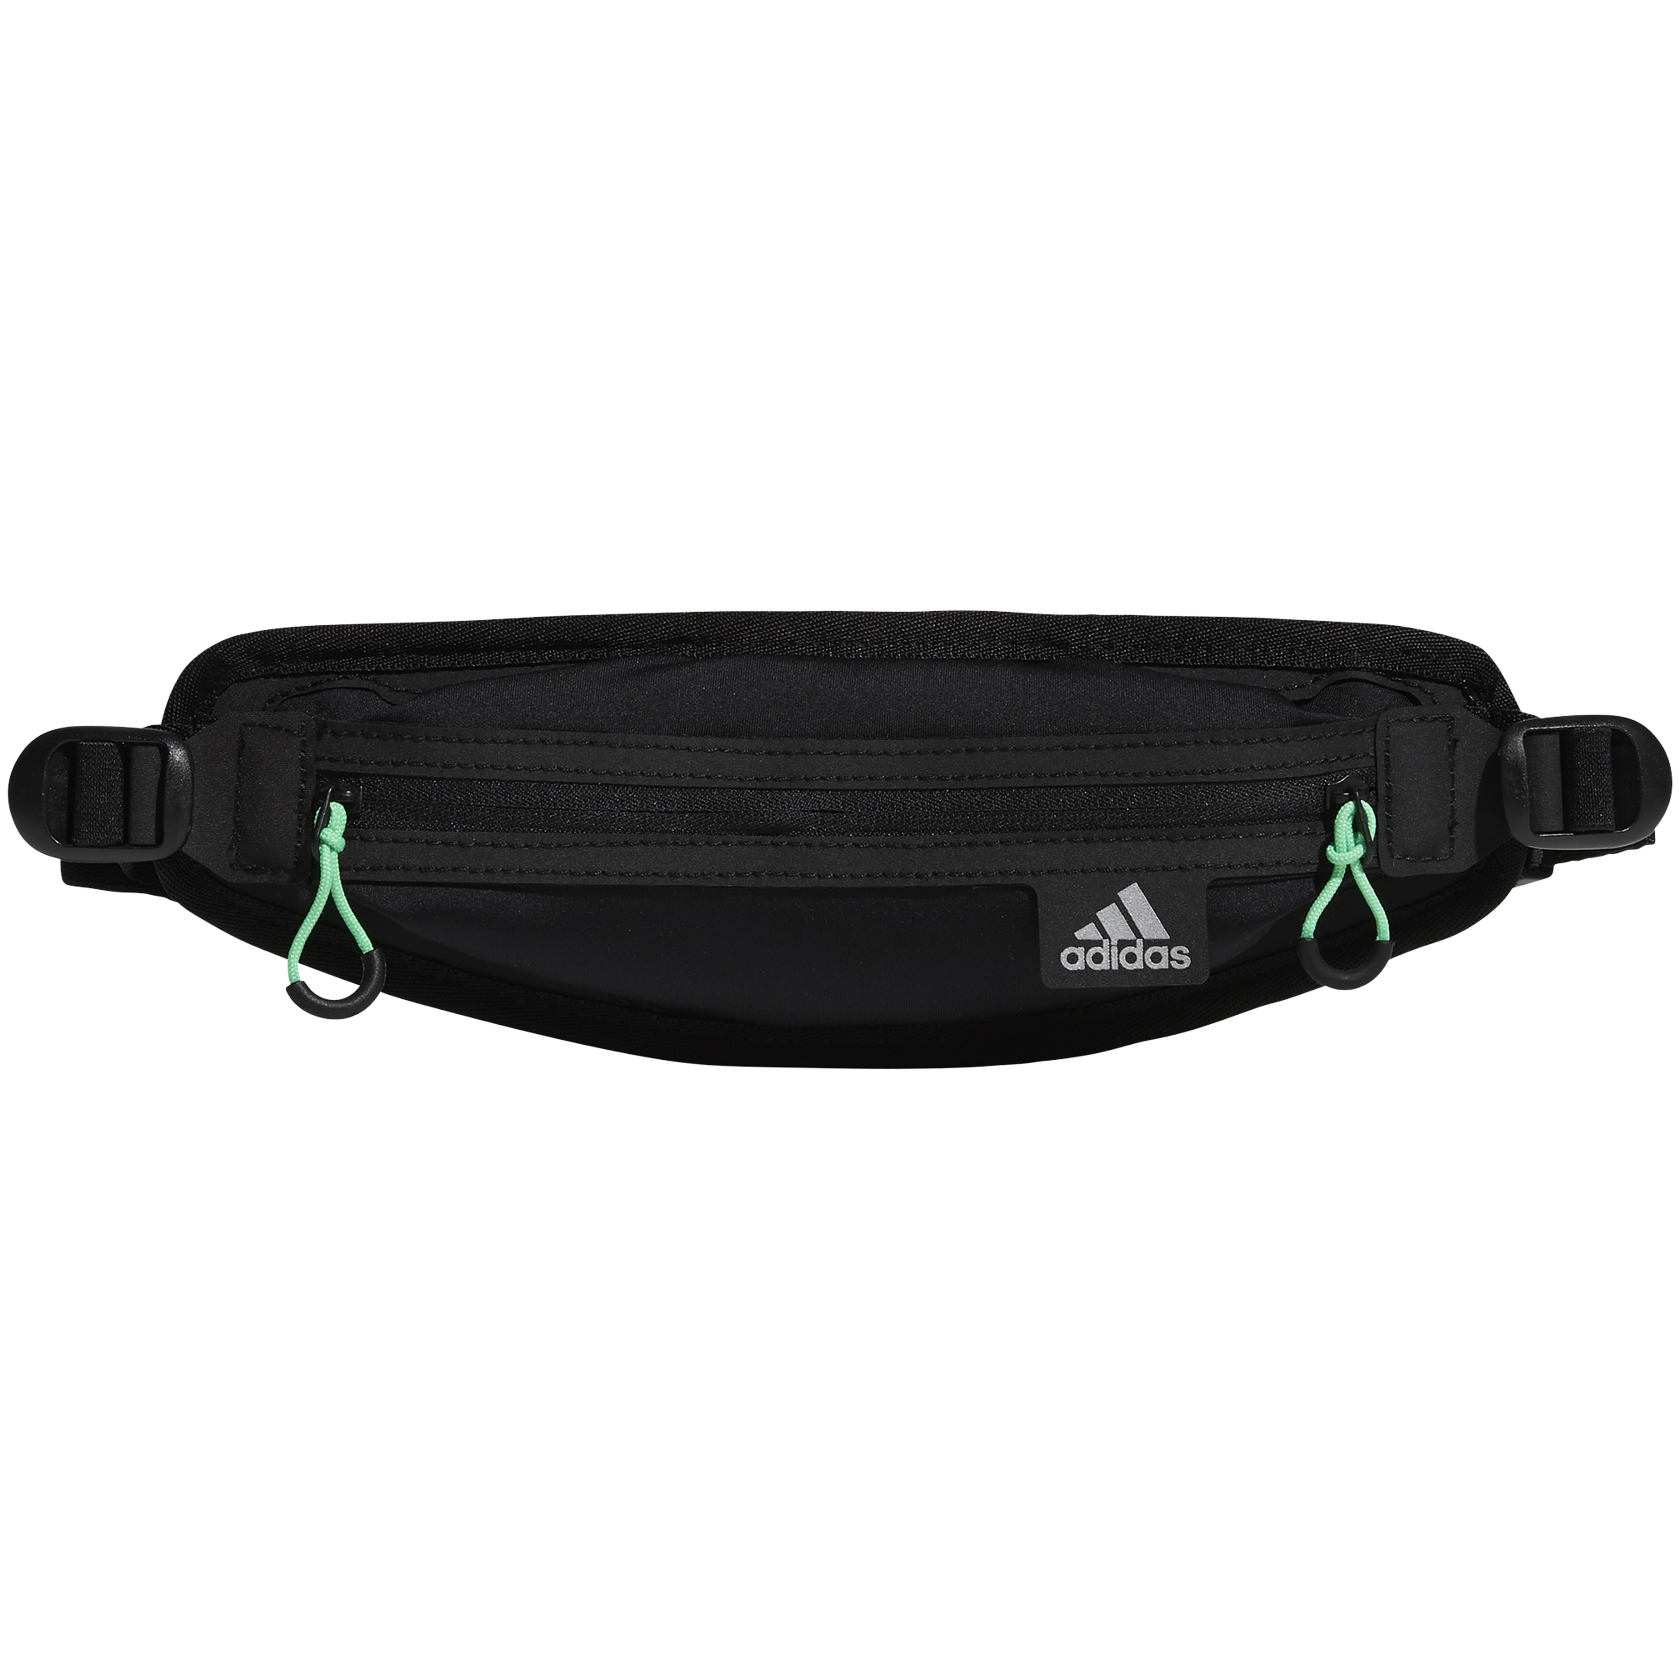 adidas Running Basics Hip Belt - black GV3363